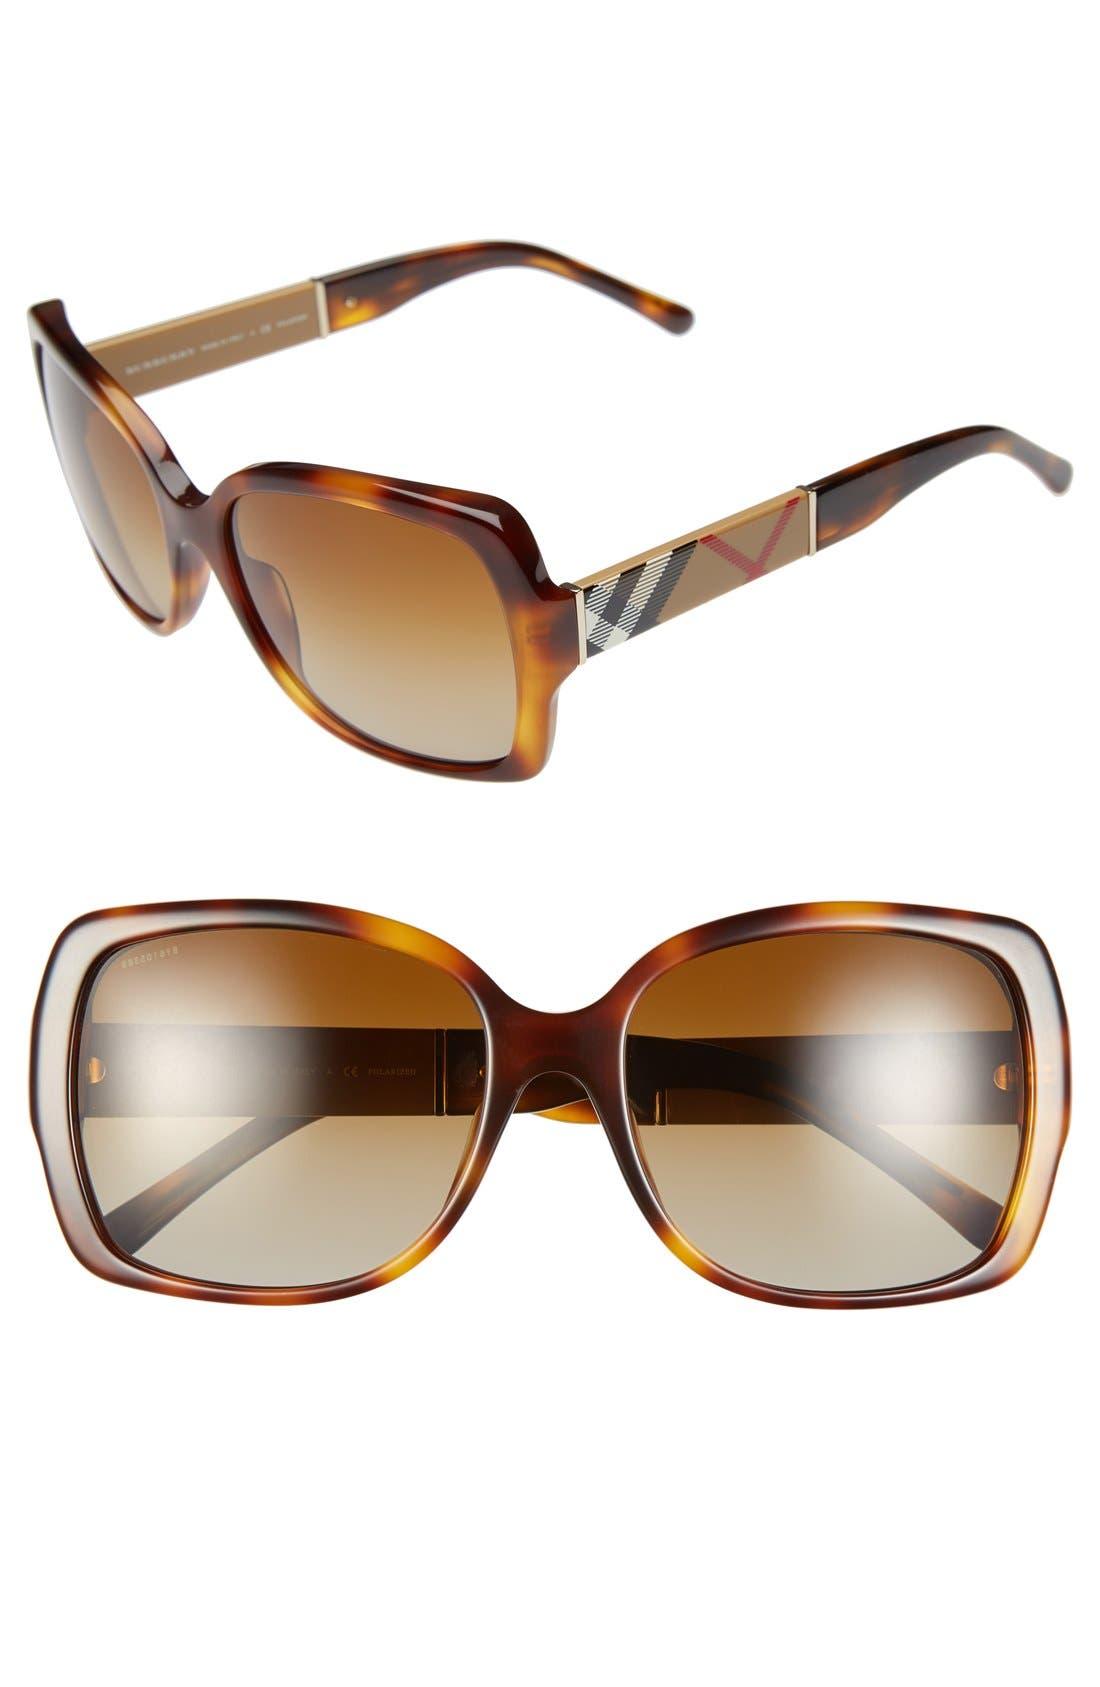 Main Image - Burberry 58mm Polarized Sunglasses